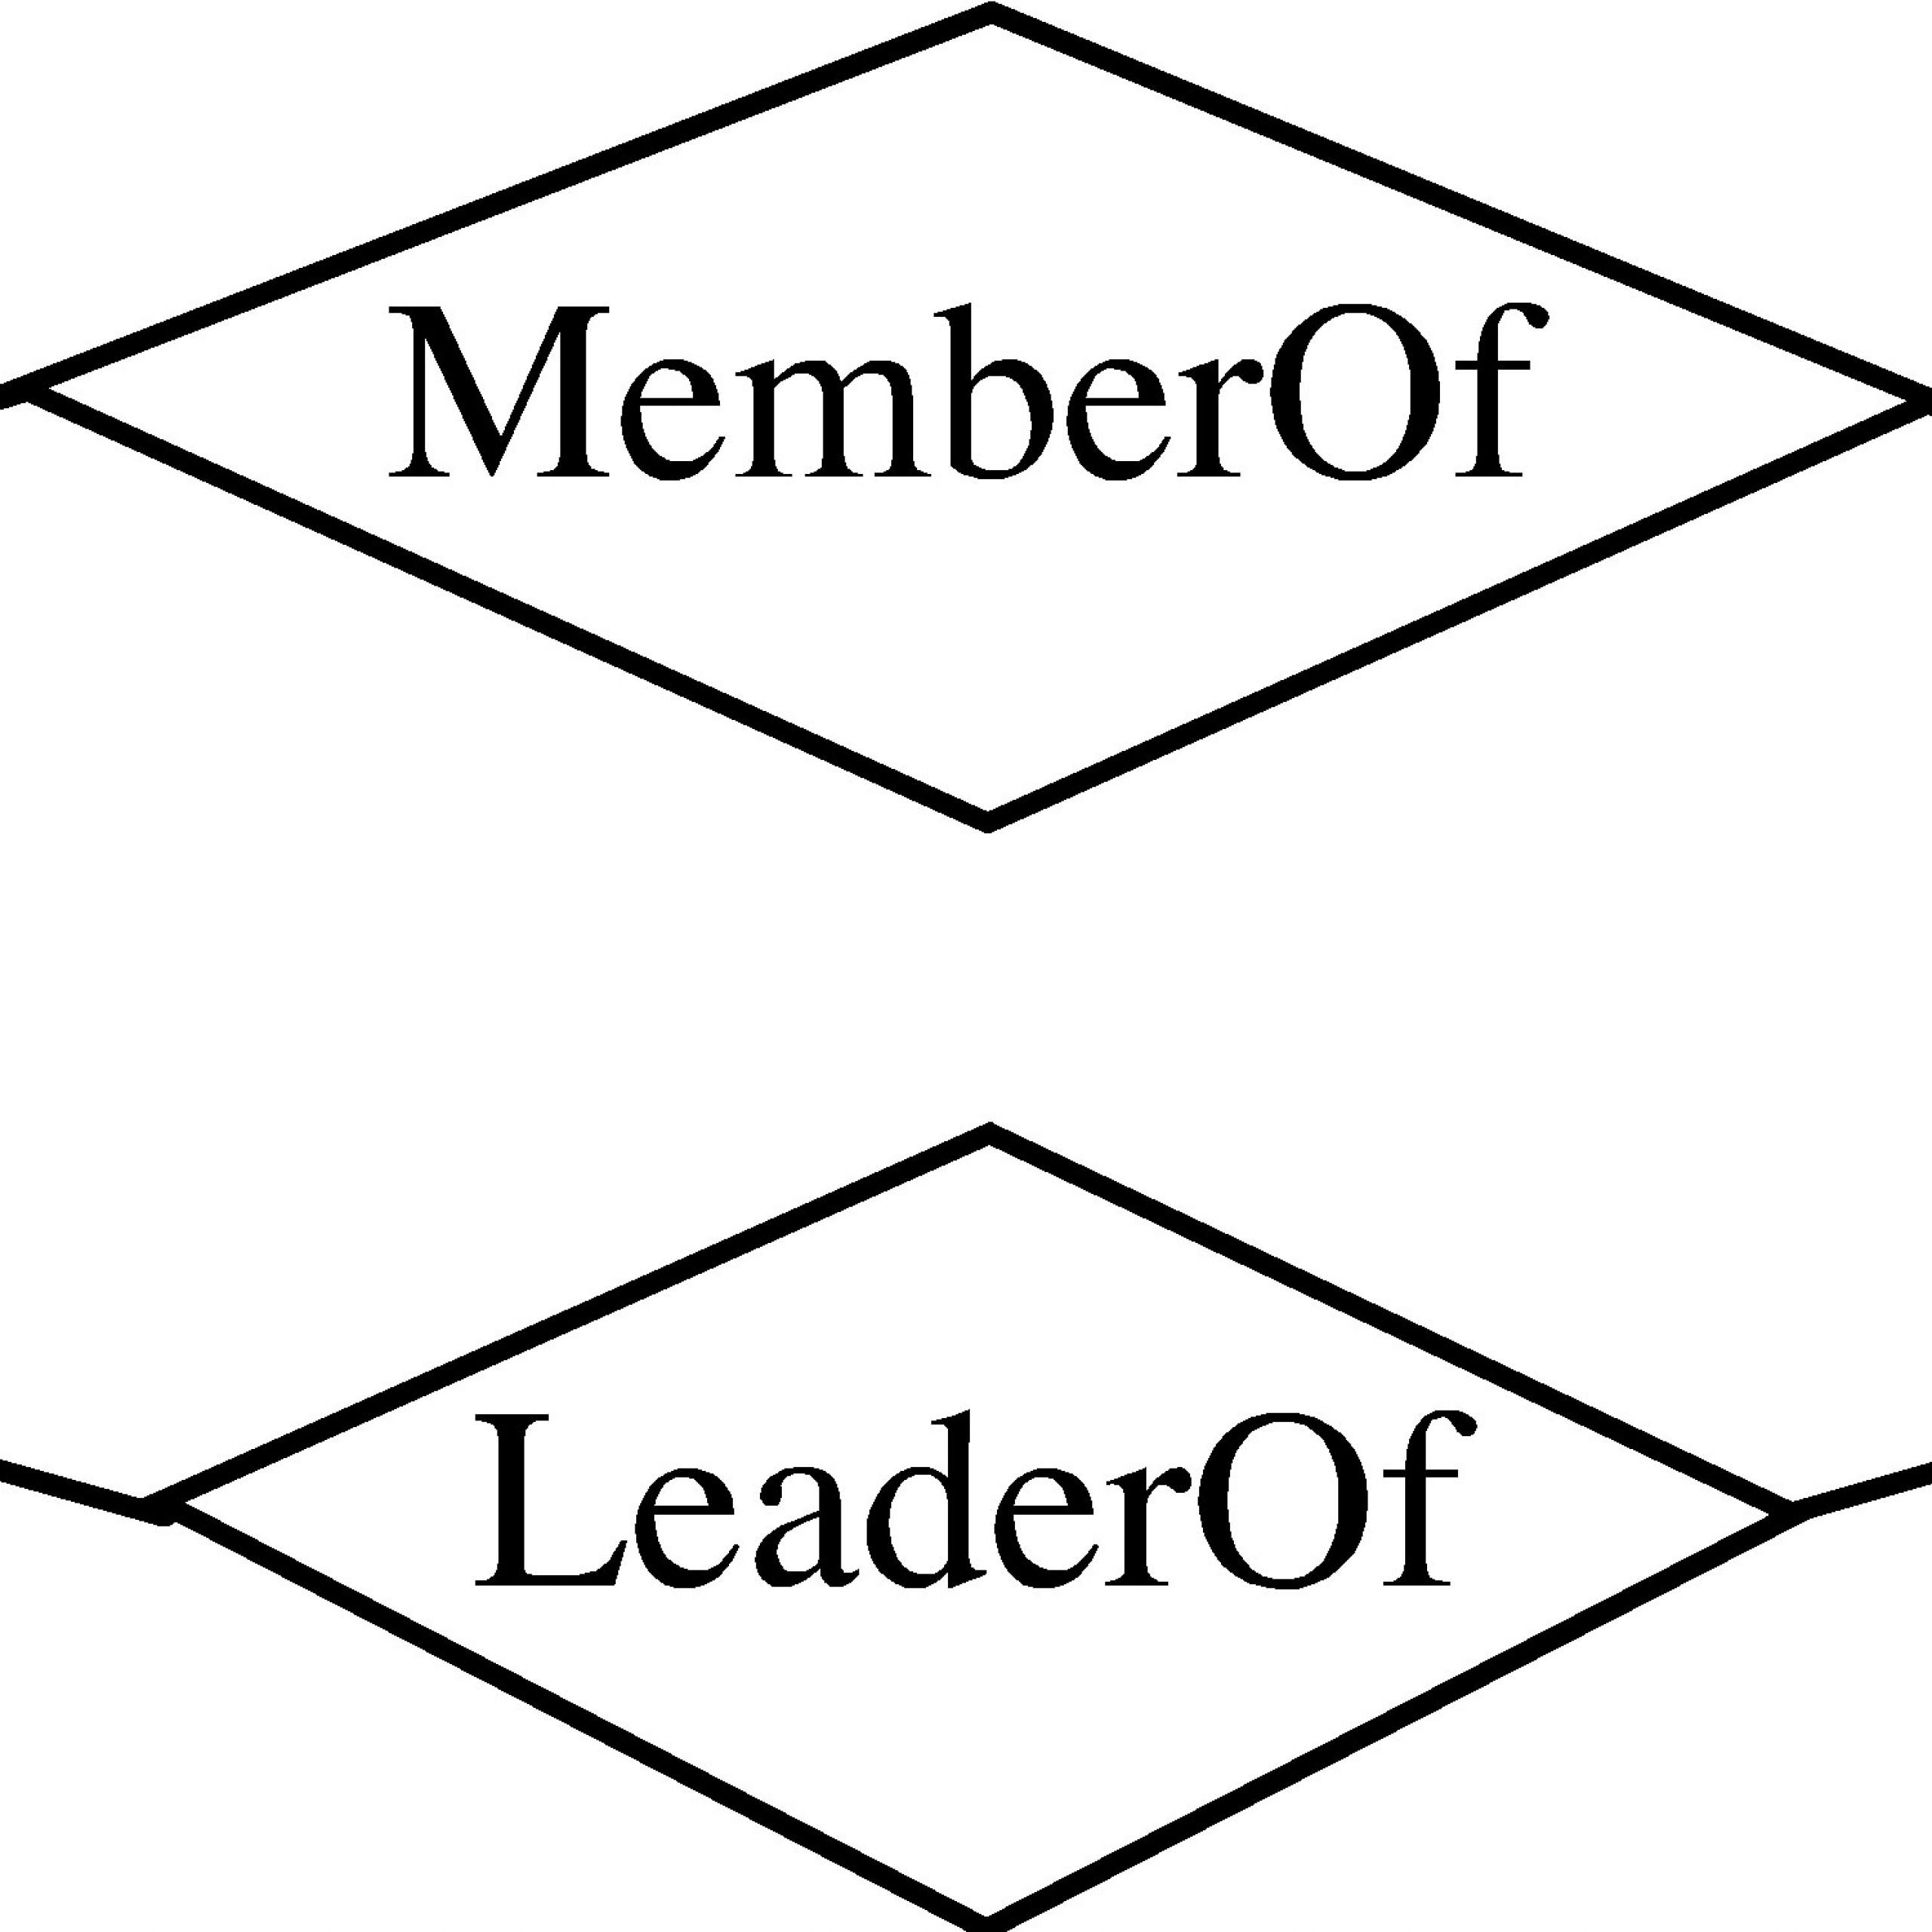 Entity-Relationship Model for Double Line In Er Diagram